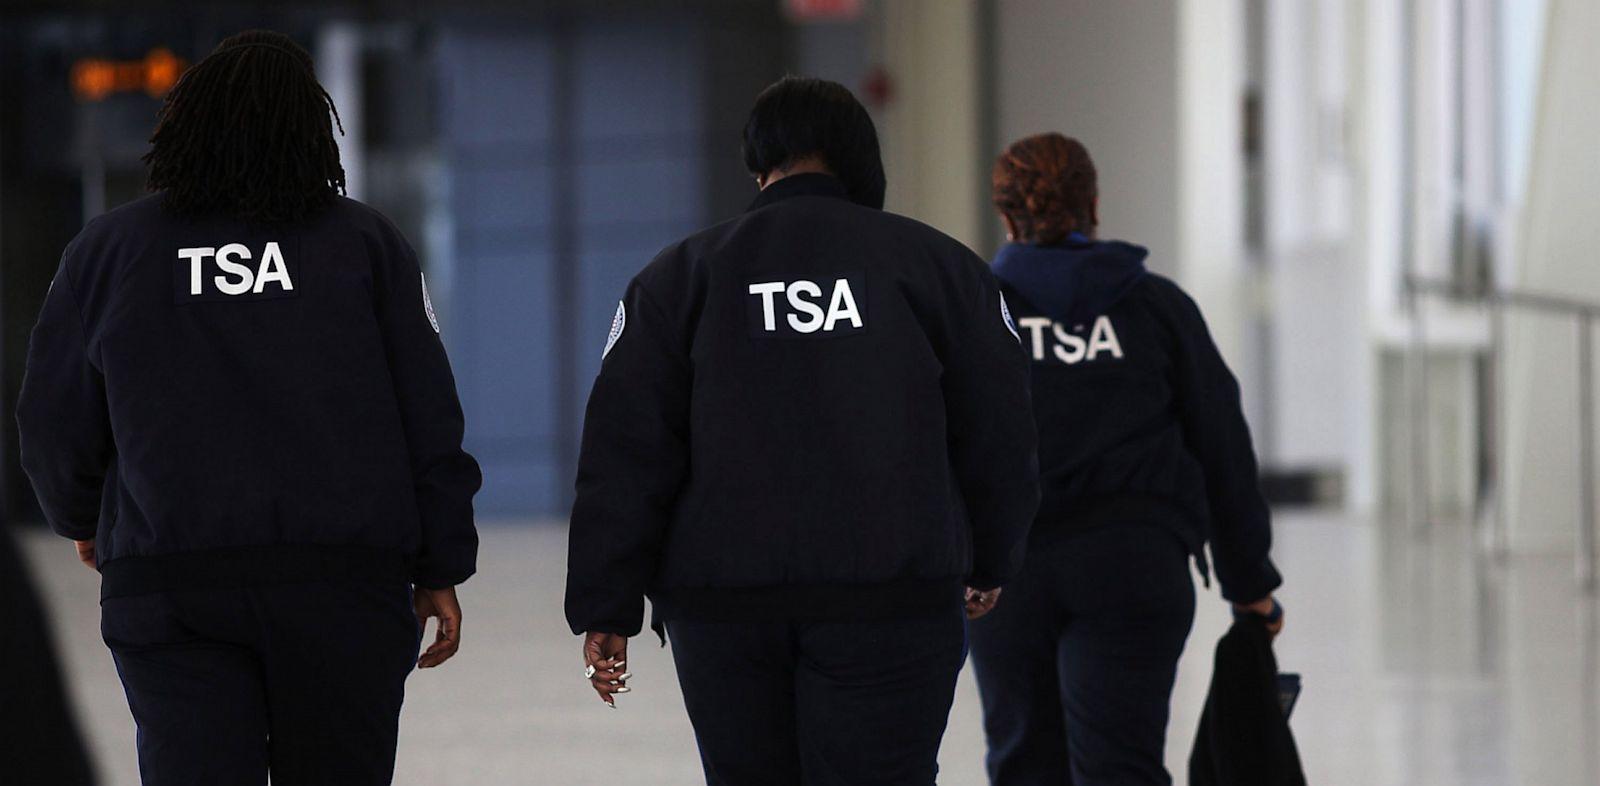 PHOTO: Transportation Security Administration (TSA) workers